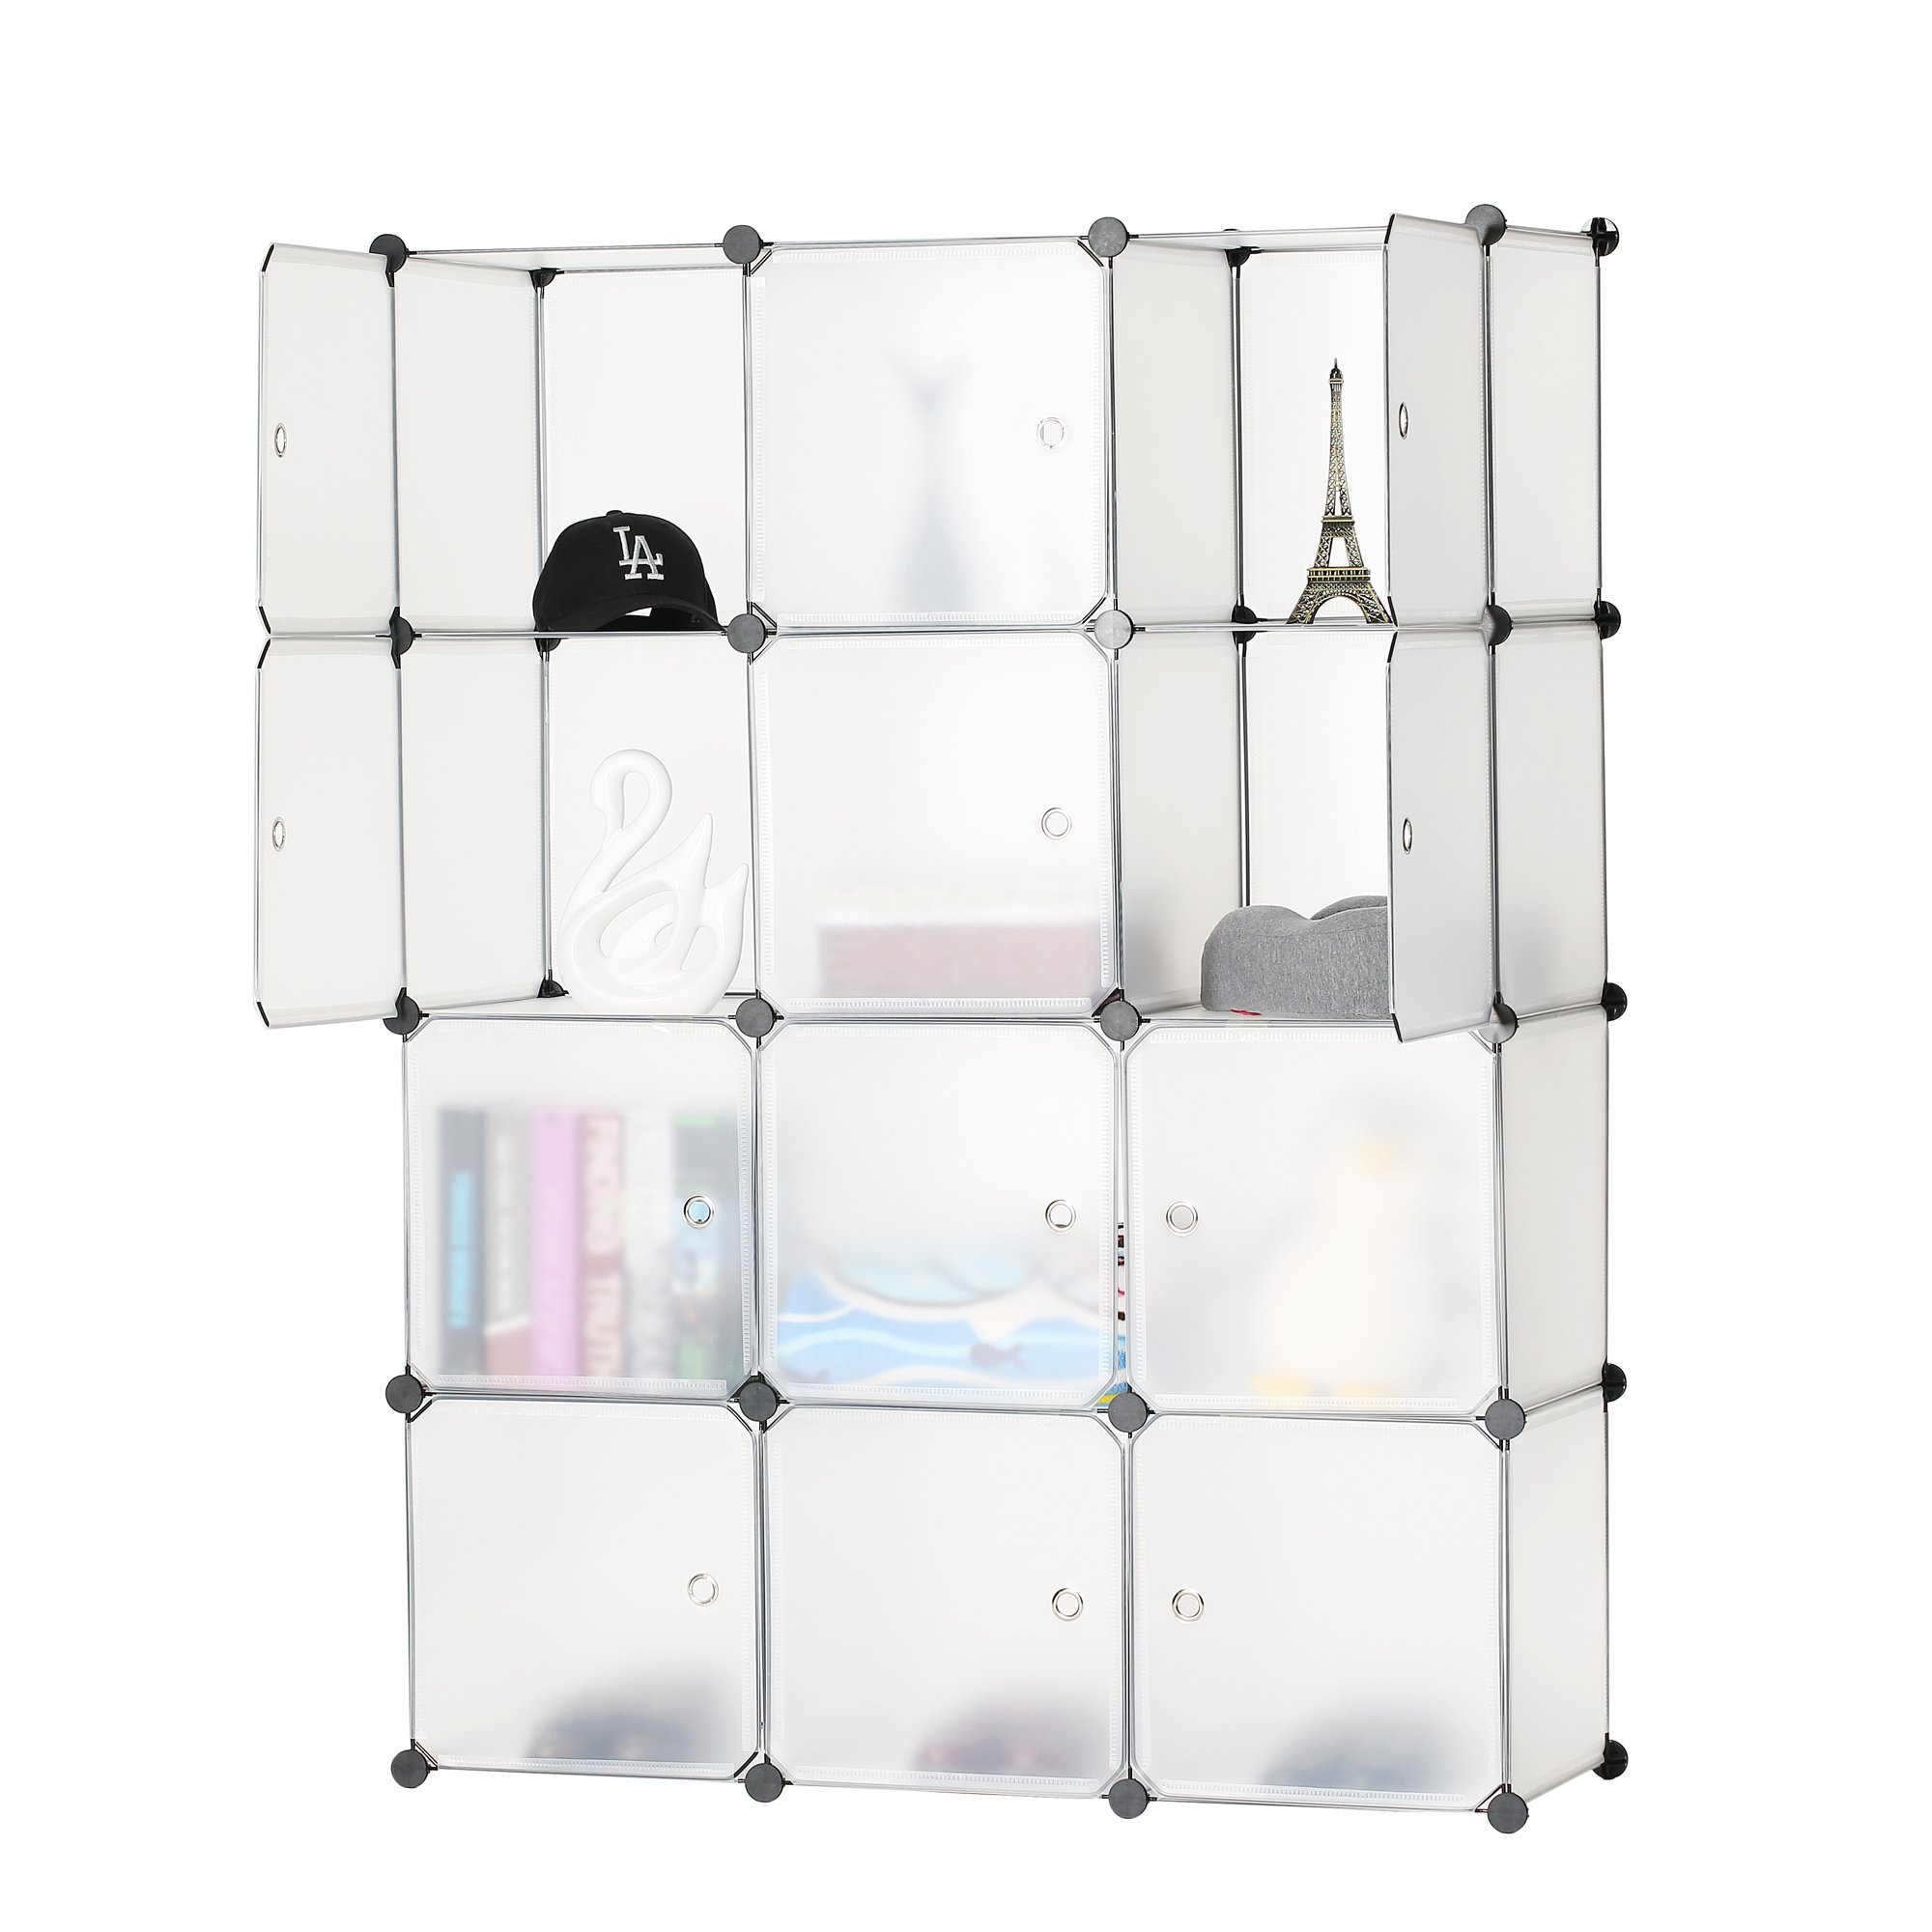 BASTUO 12-Cube Storage DIY Modular Cube Organizer Cabinet 4-Tier Bookcase Storage Cube Organizer Closet with Door